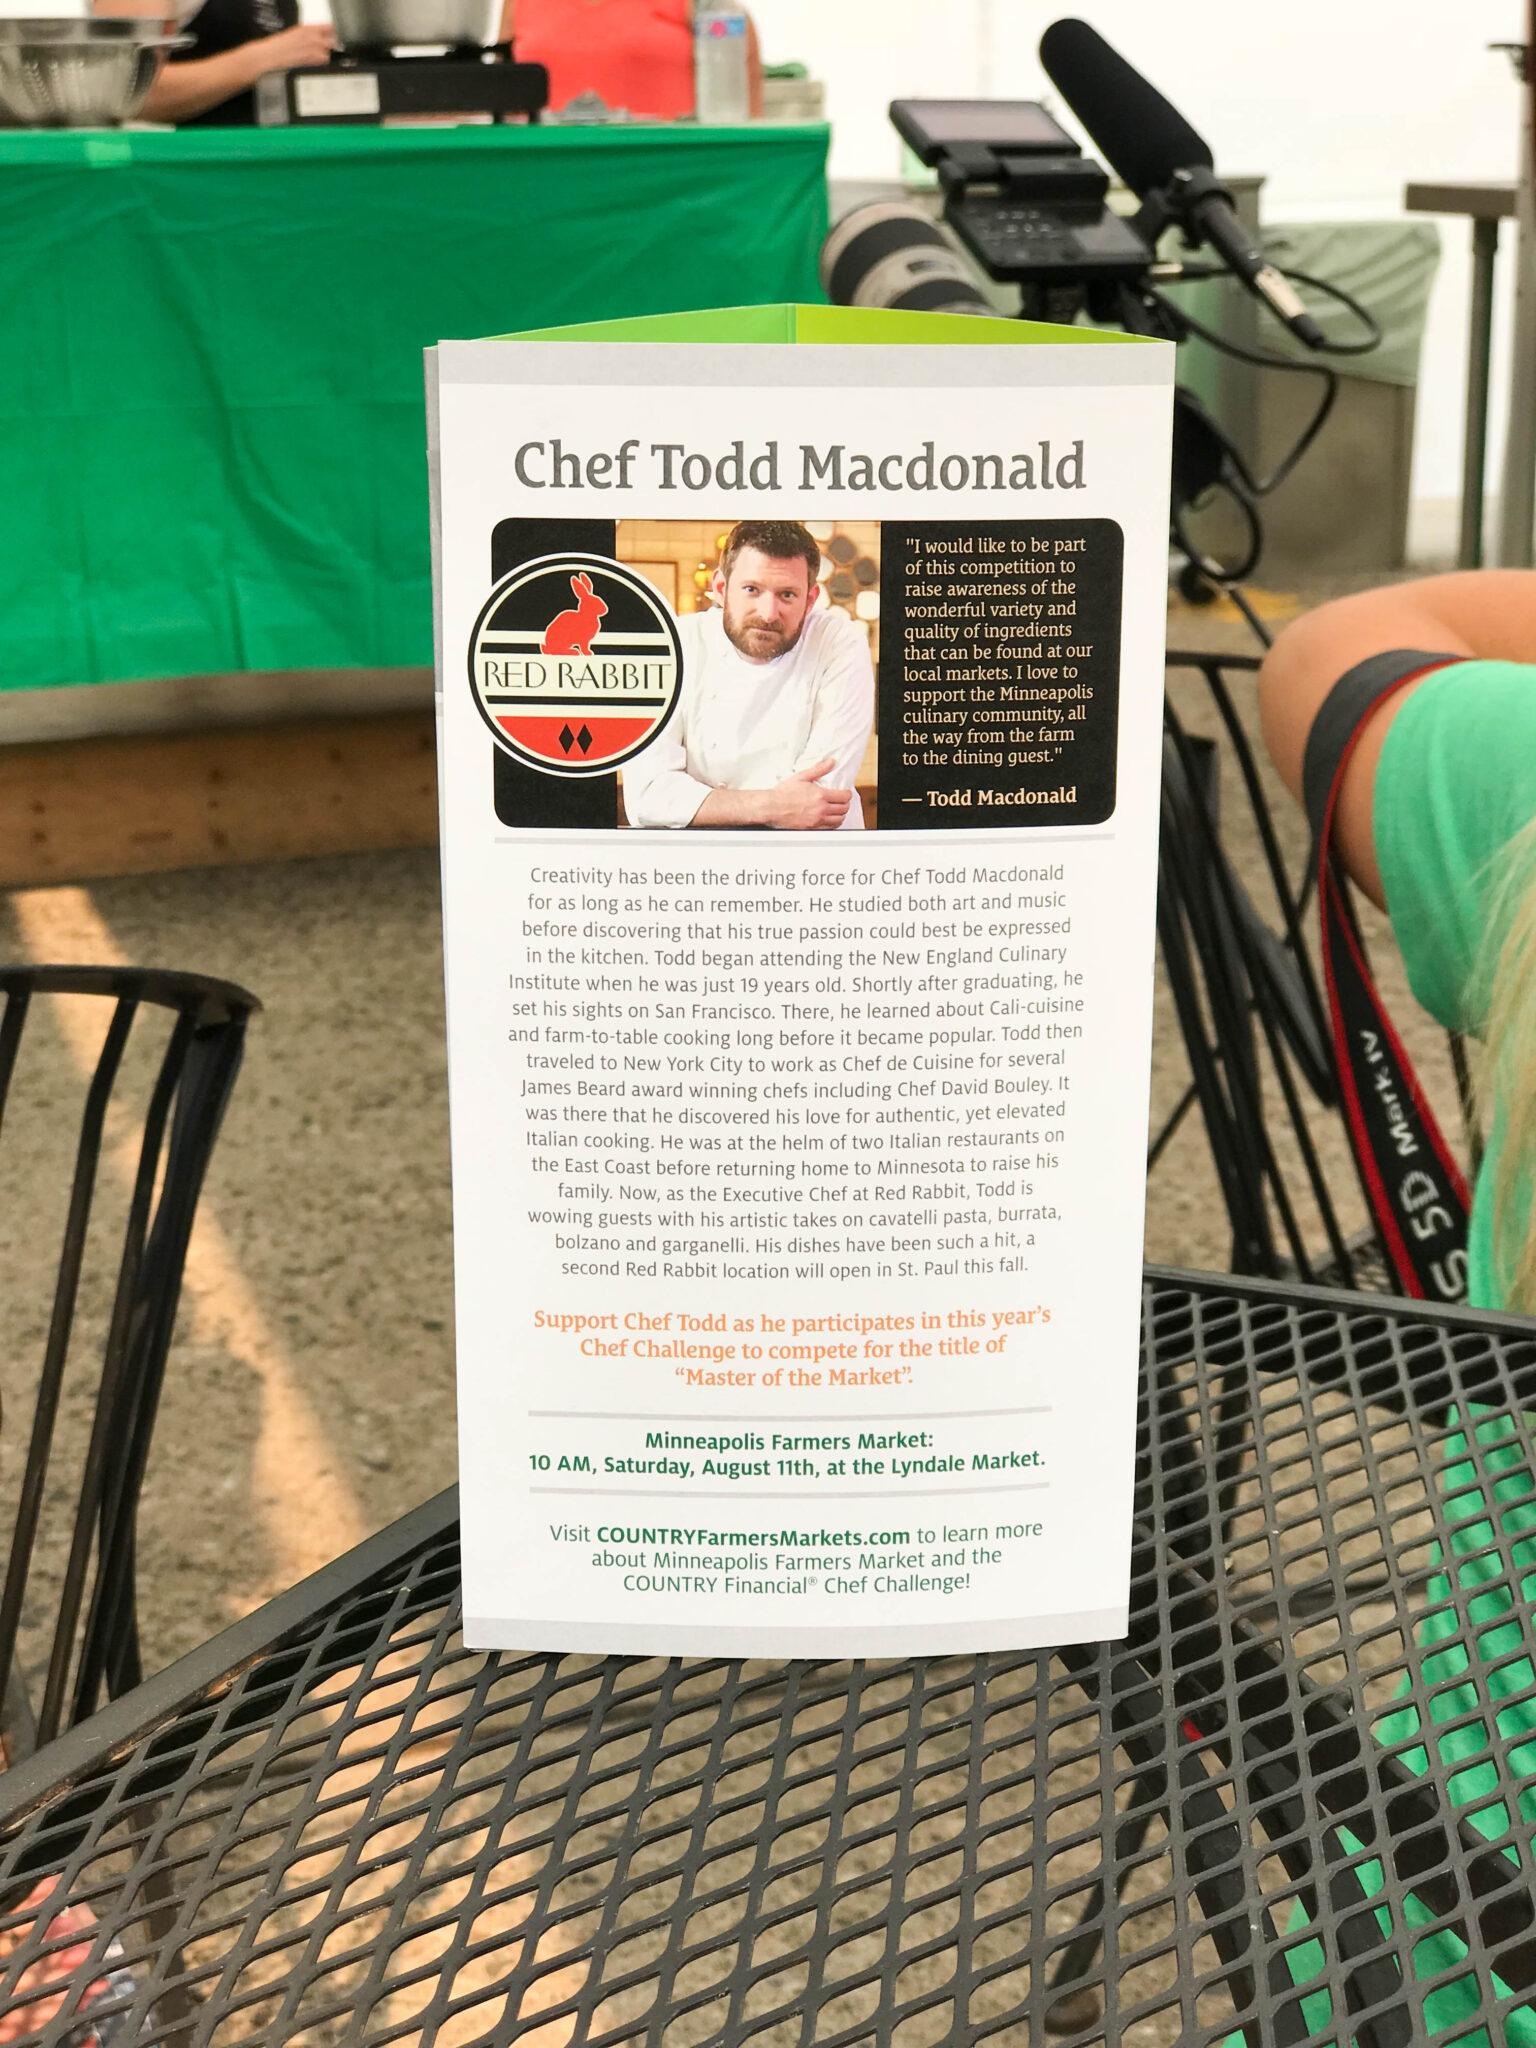 Chef Todd Macdonald